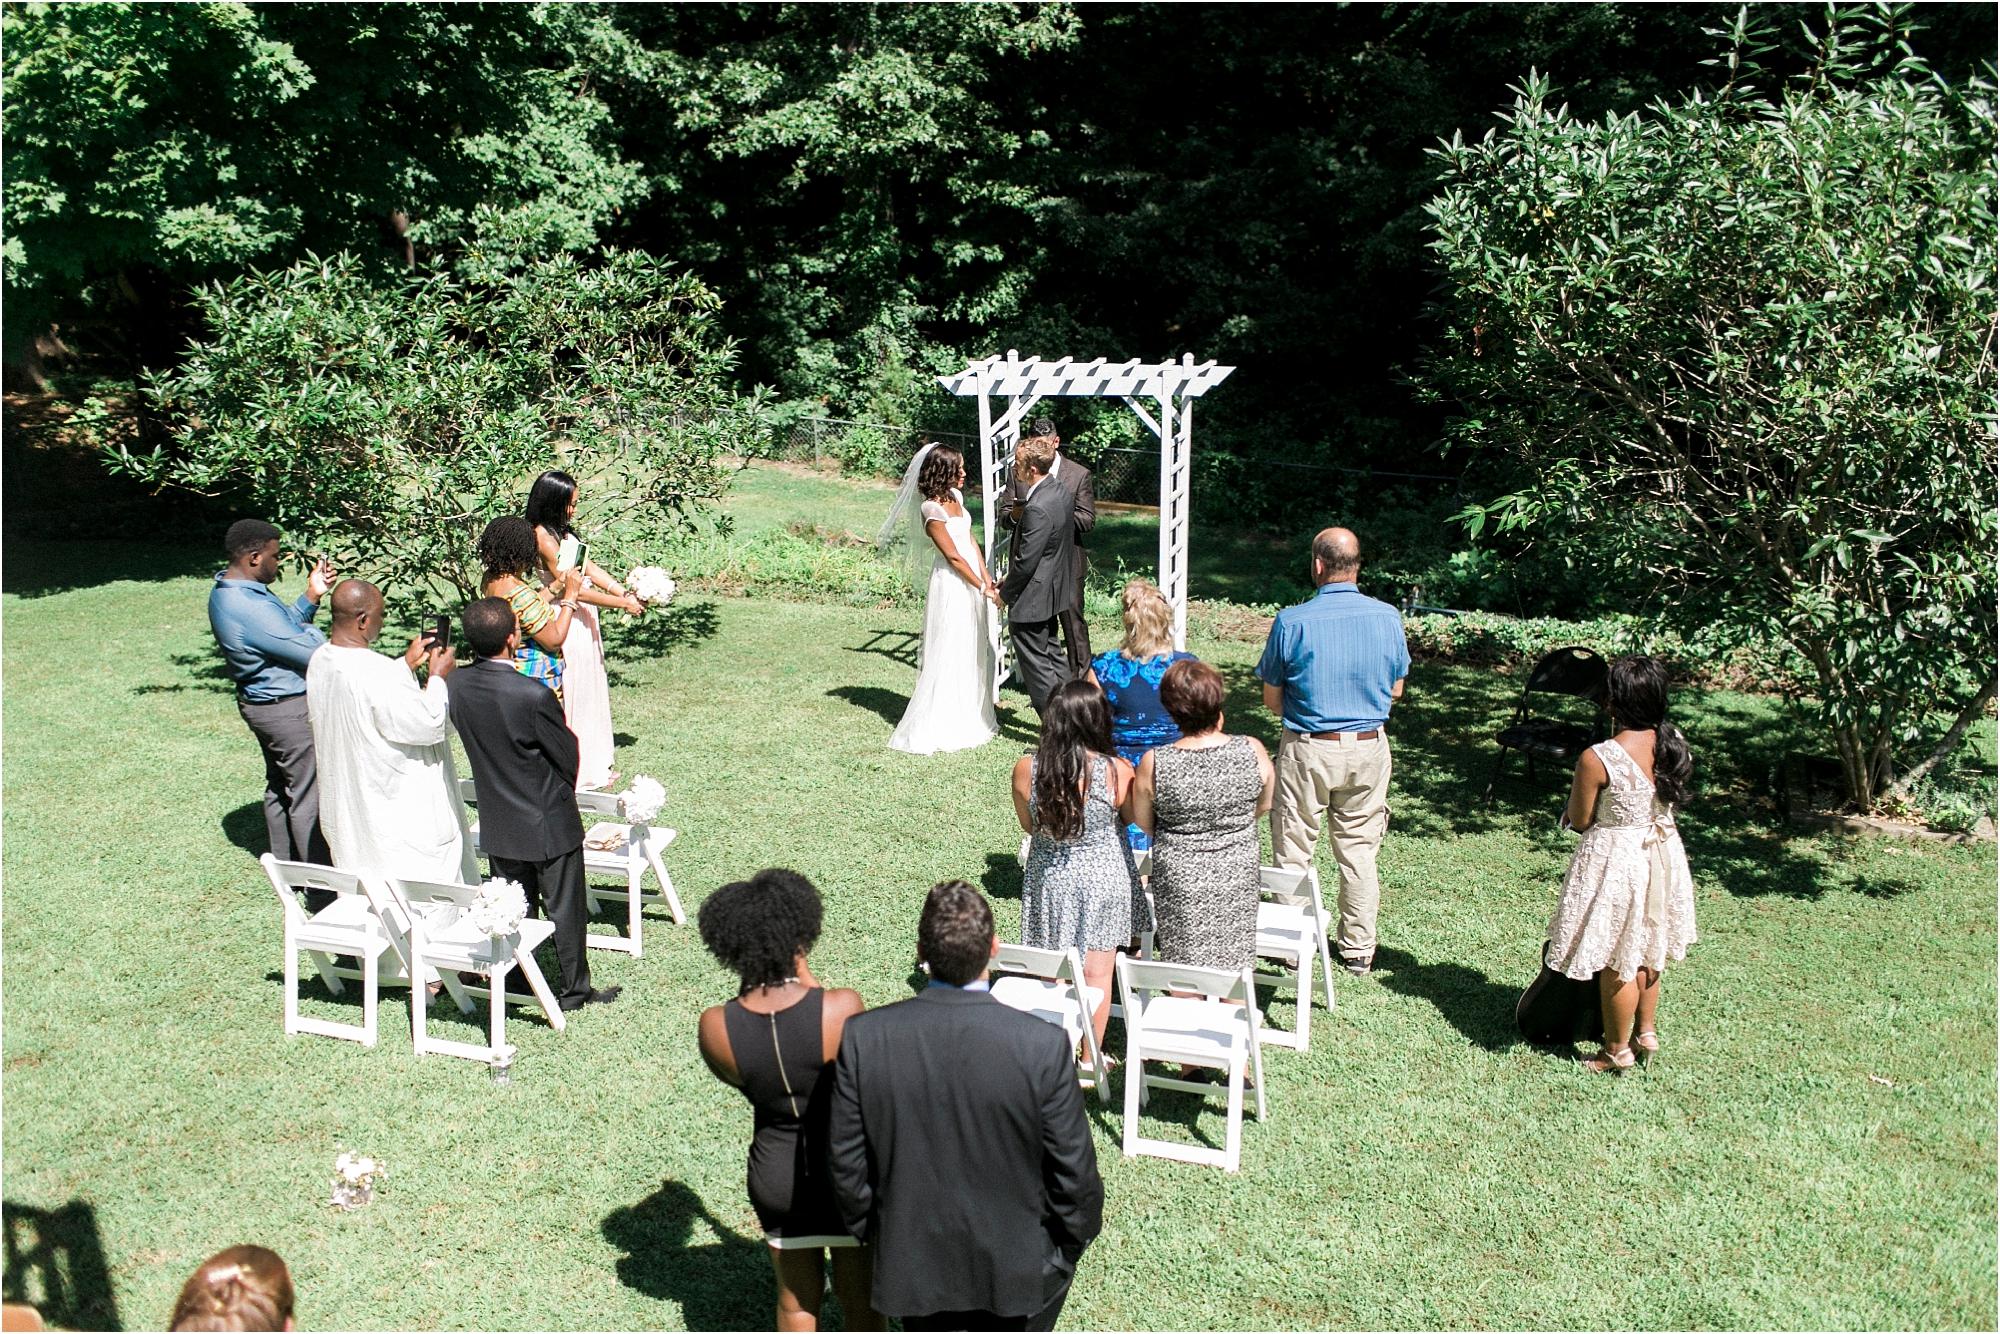 inimate-richmond-virginia-backyard-summer-wedding-photos_0006.jpg